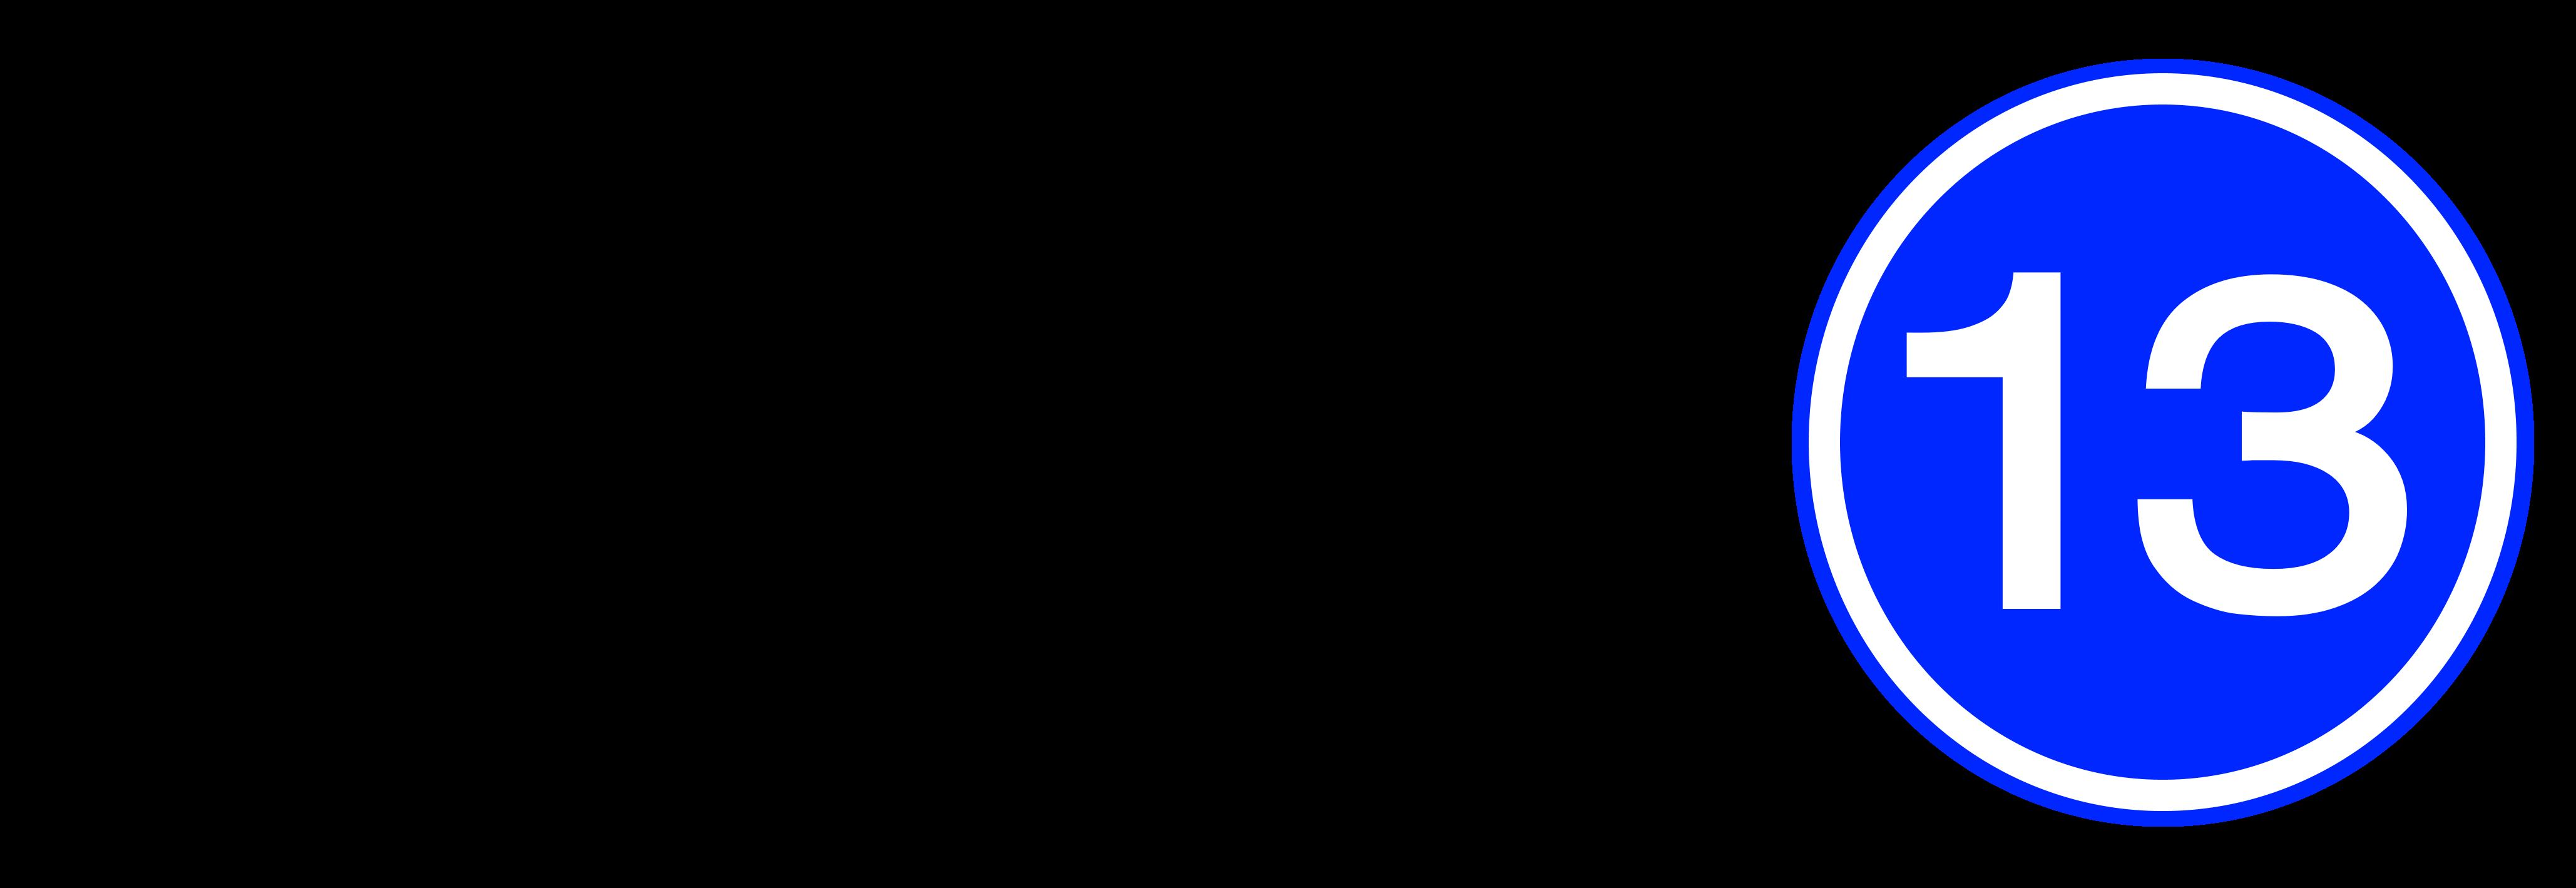 AlternateHistory.com's KTRK logo #1.png